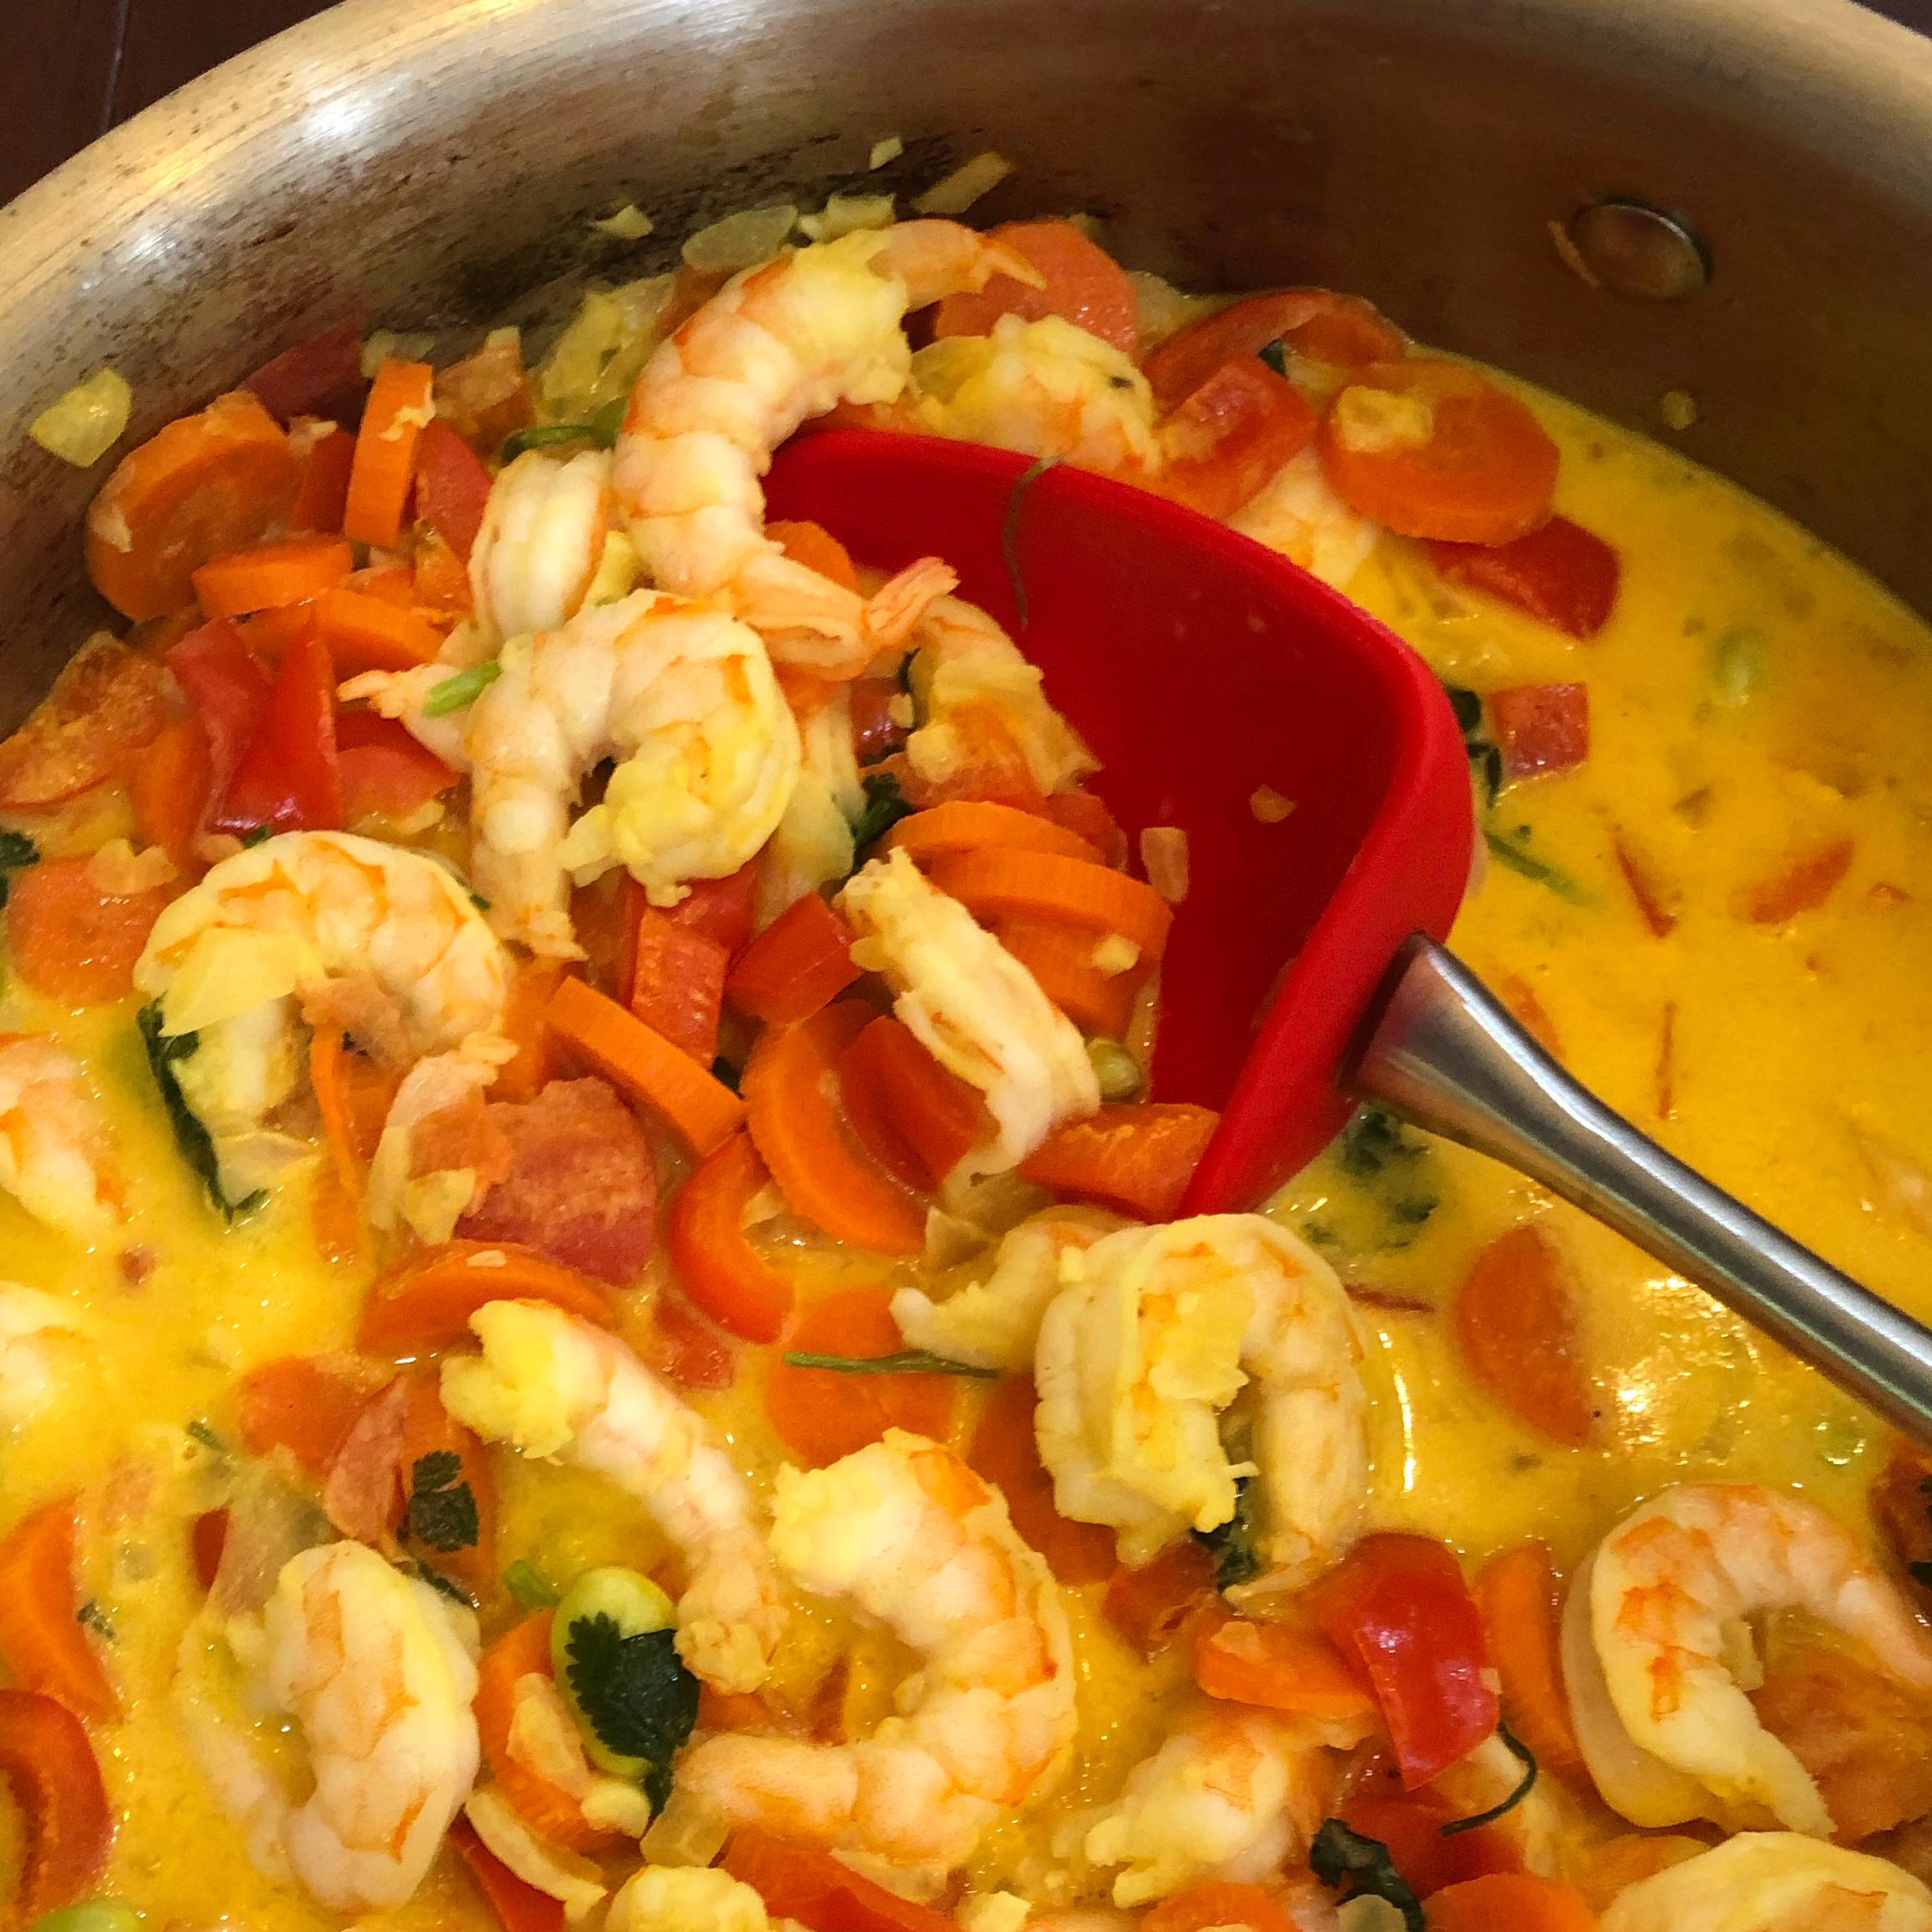 Coconut Milk Shrimp Soup kristen.kdr